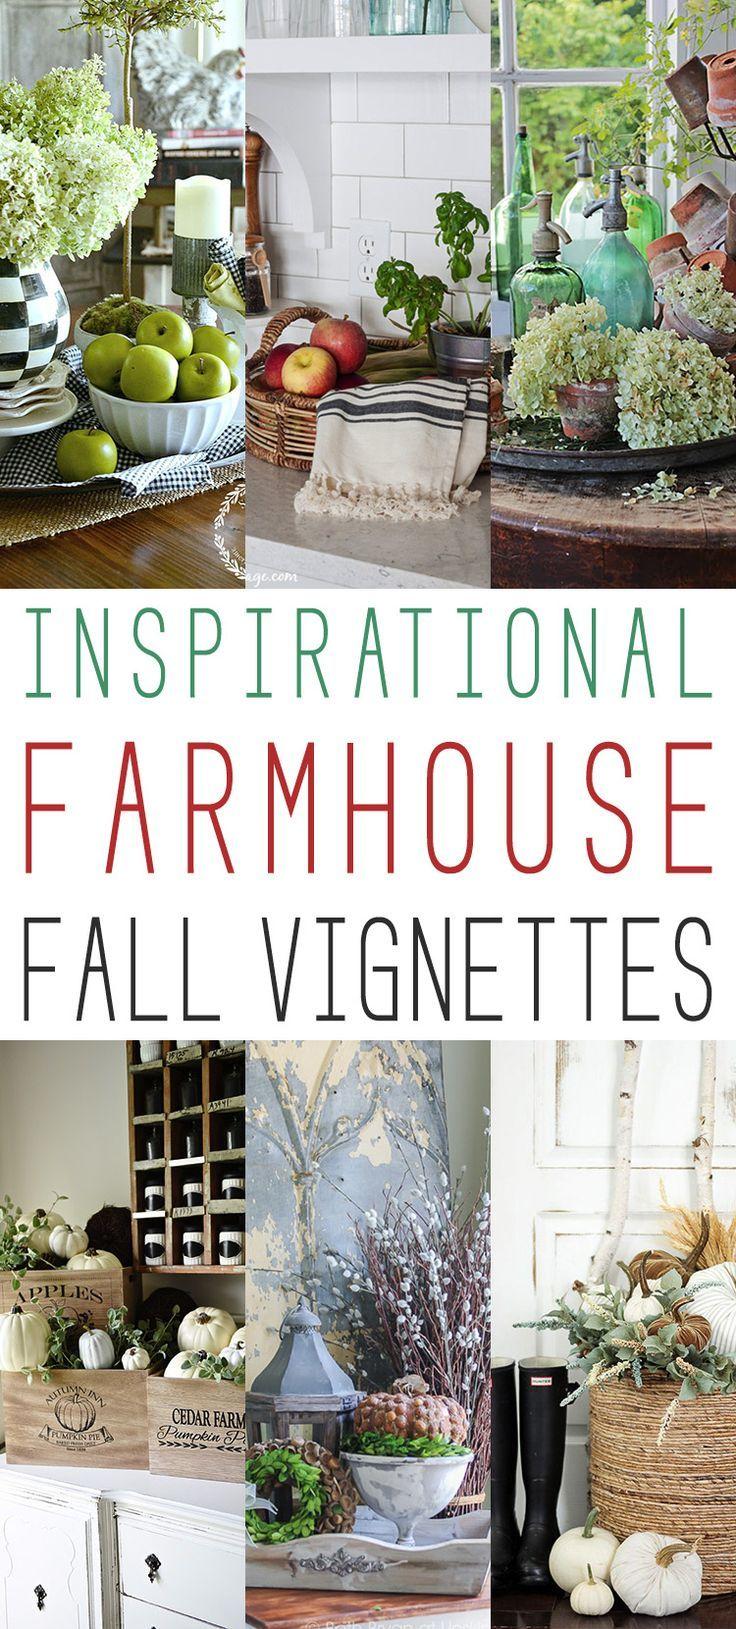 20 Inspirational Farmhouse Fall Vignettes - The Cottage Market